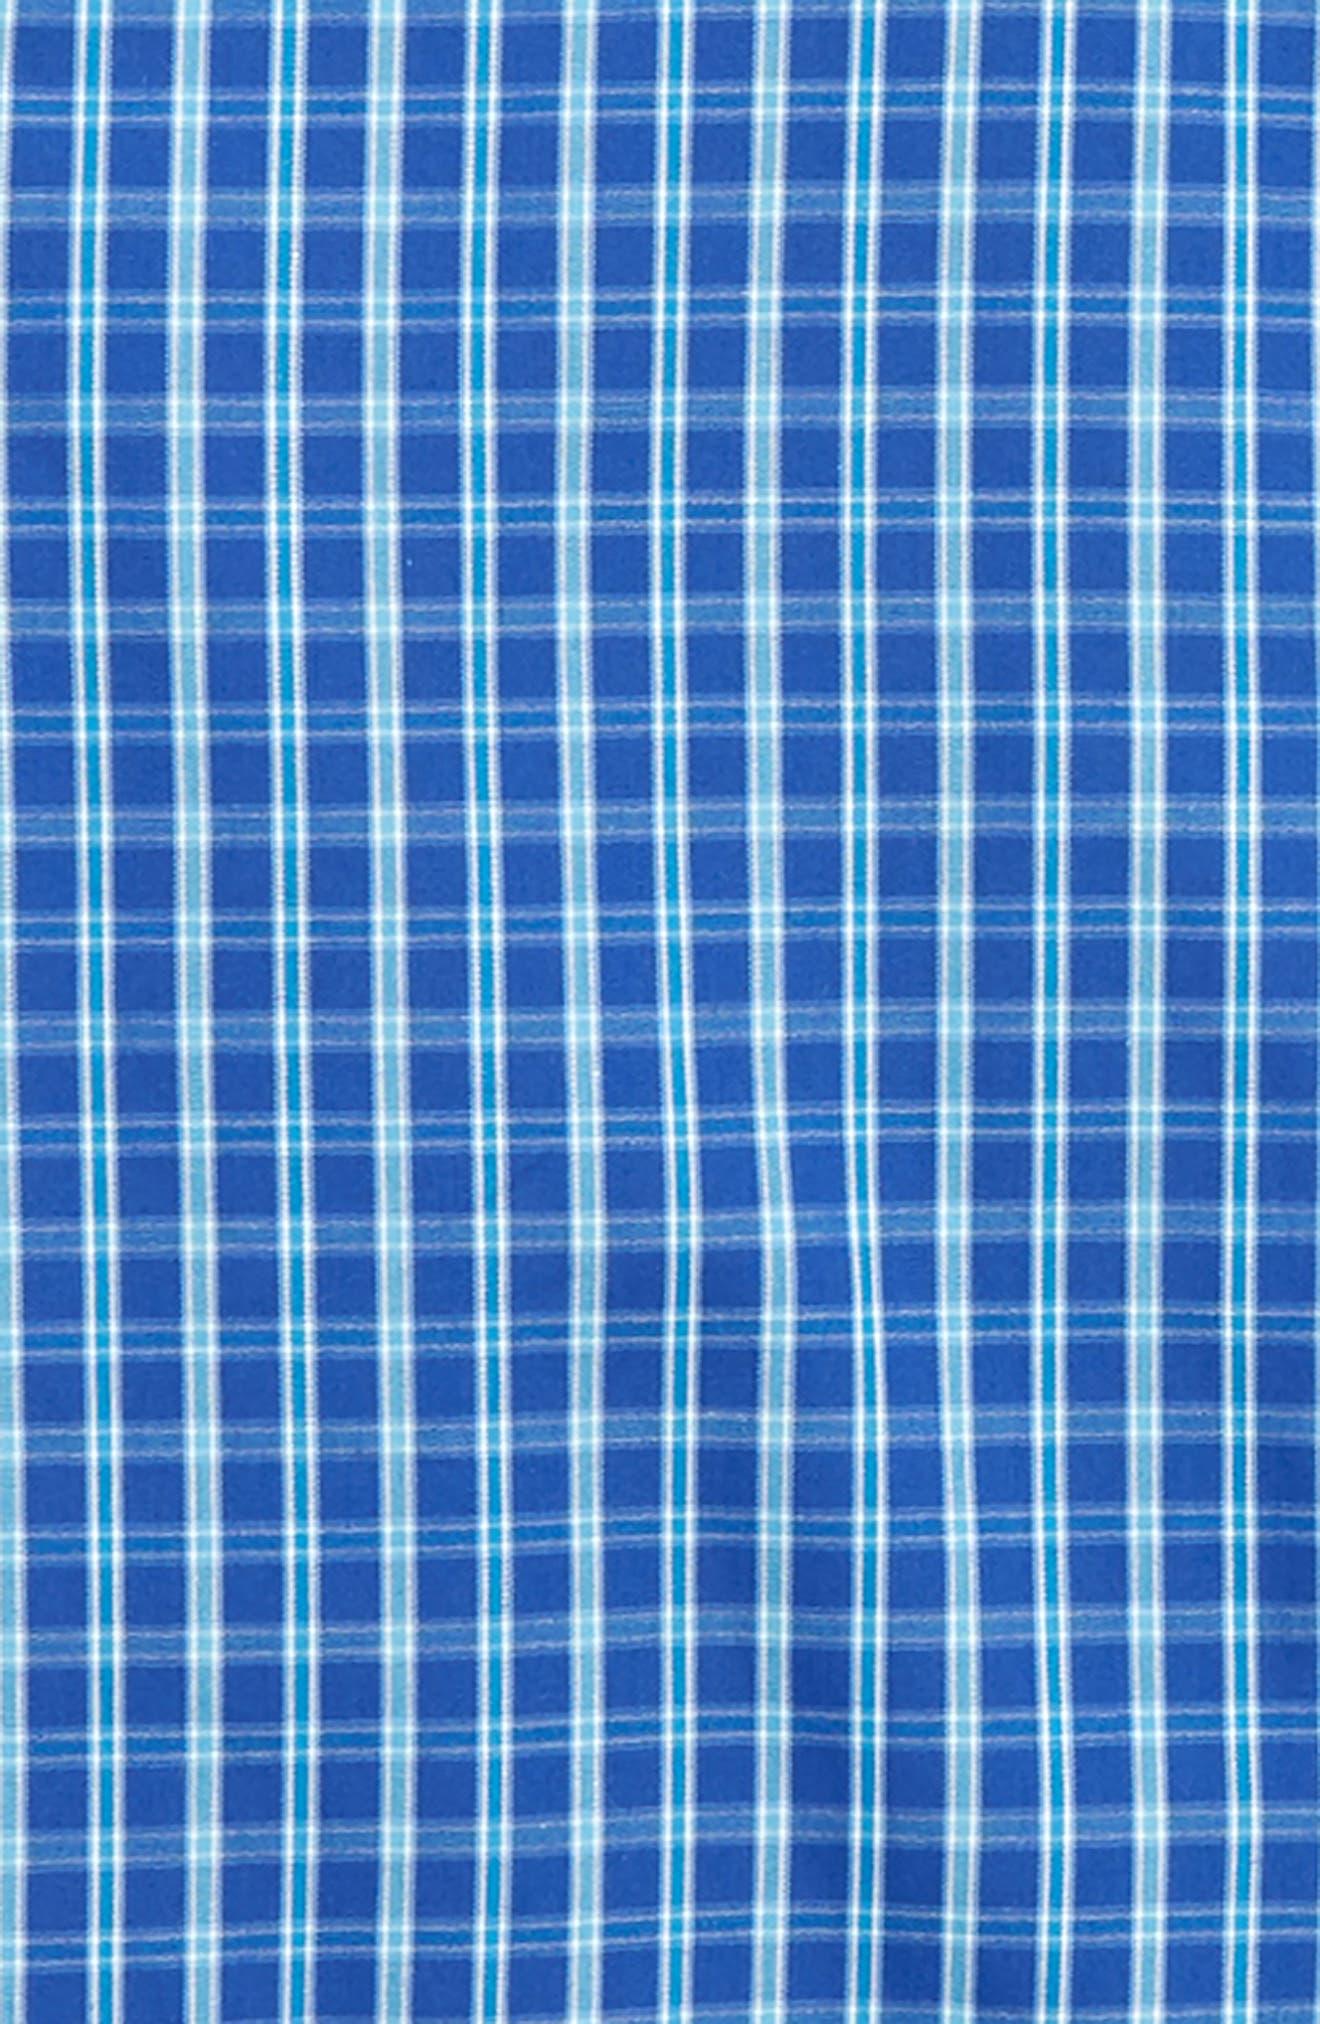 Plaid Dress Shirt,                             Alternate thumbnail 2, color,                             Blue Marine Plaid